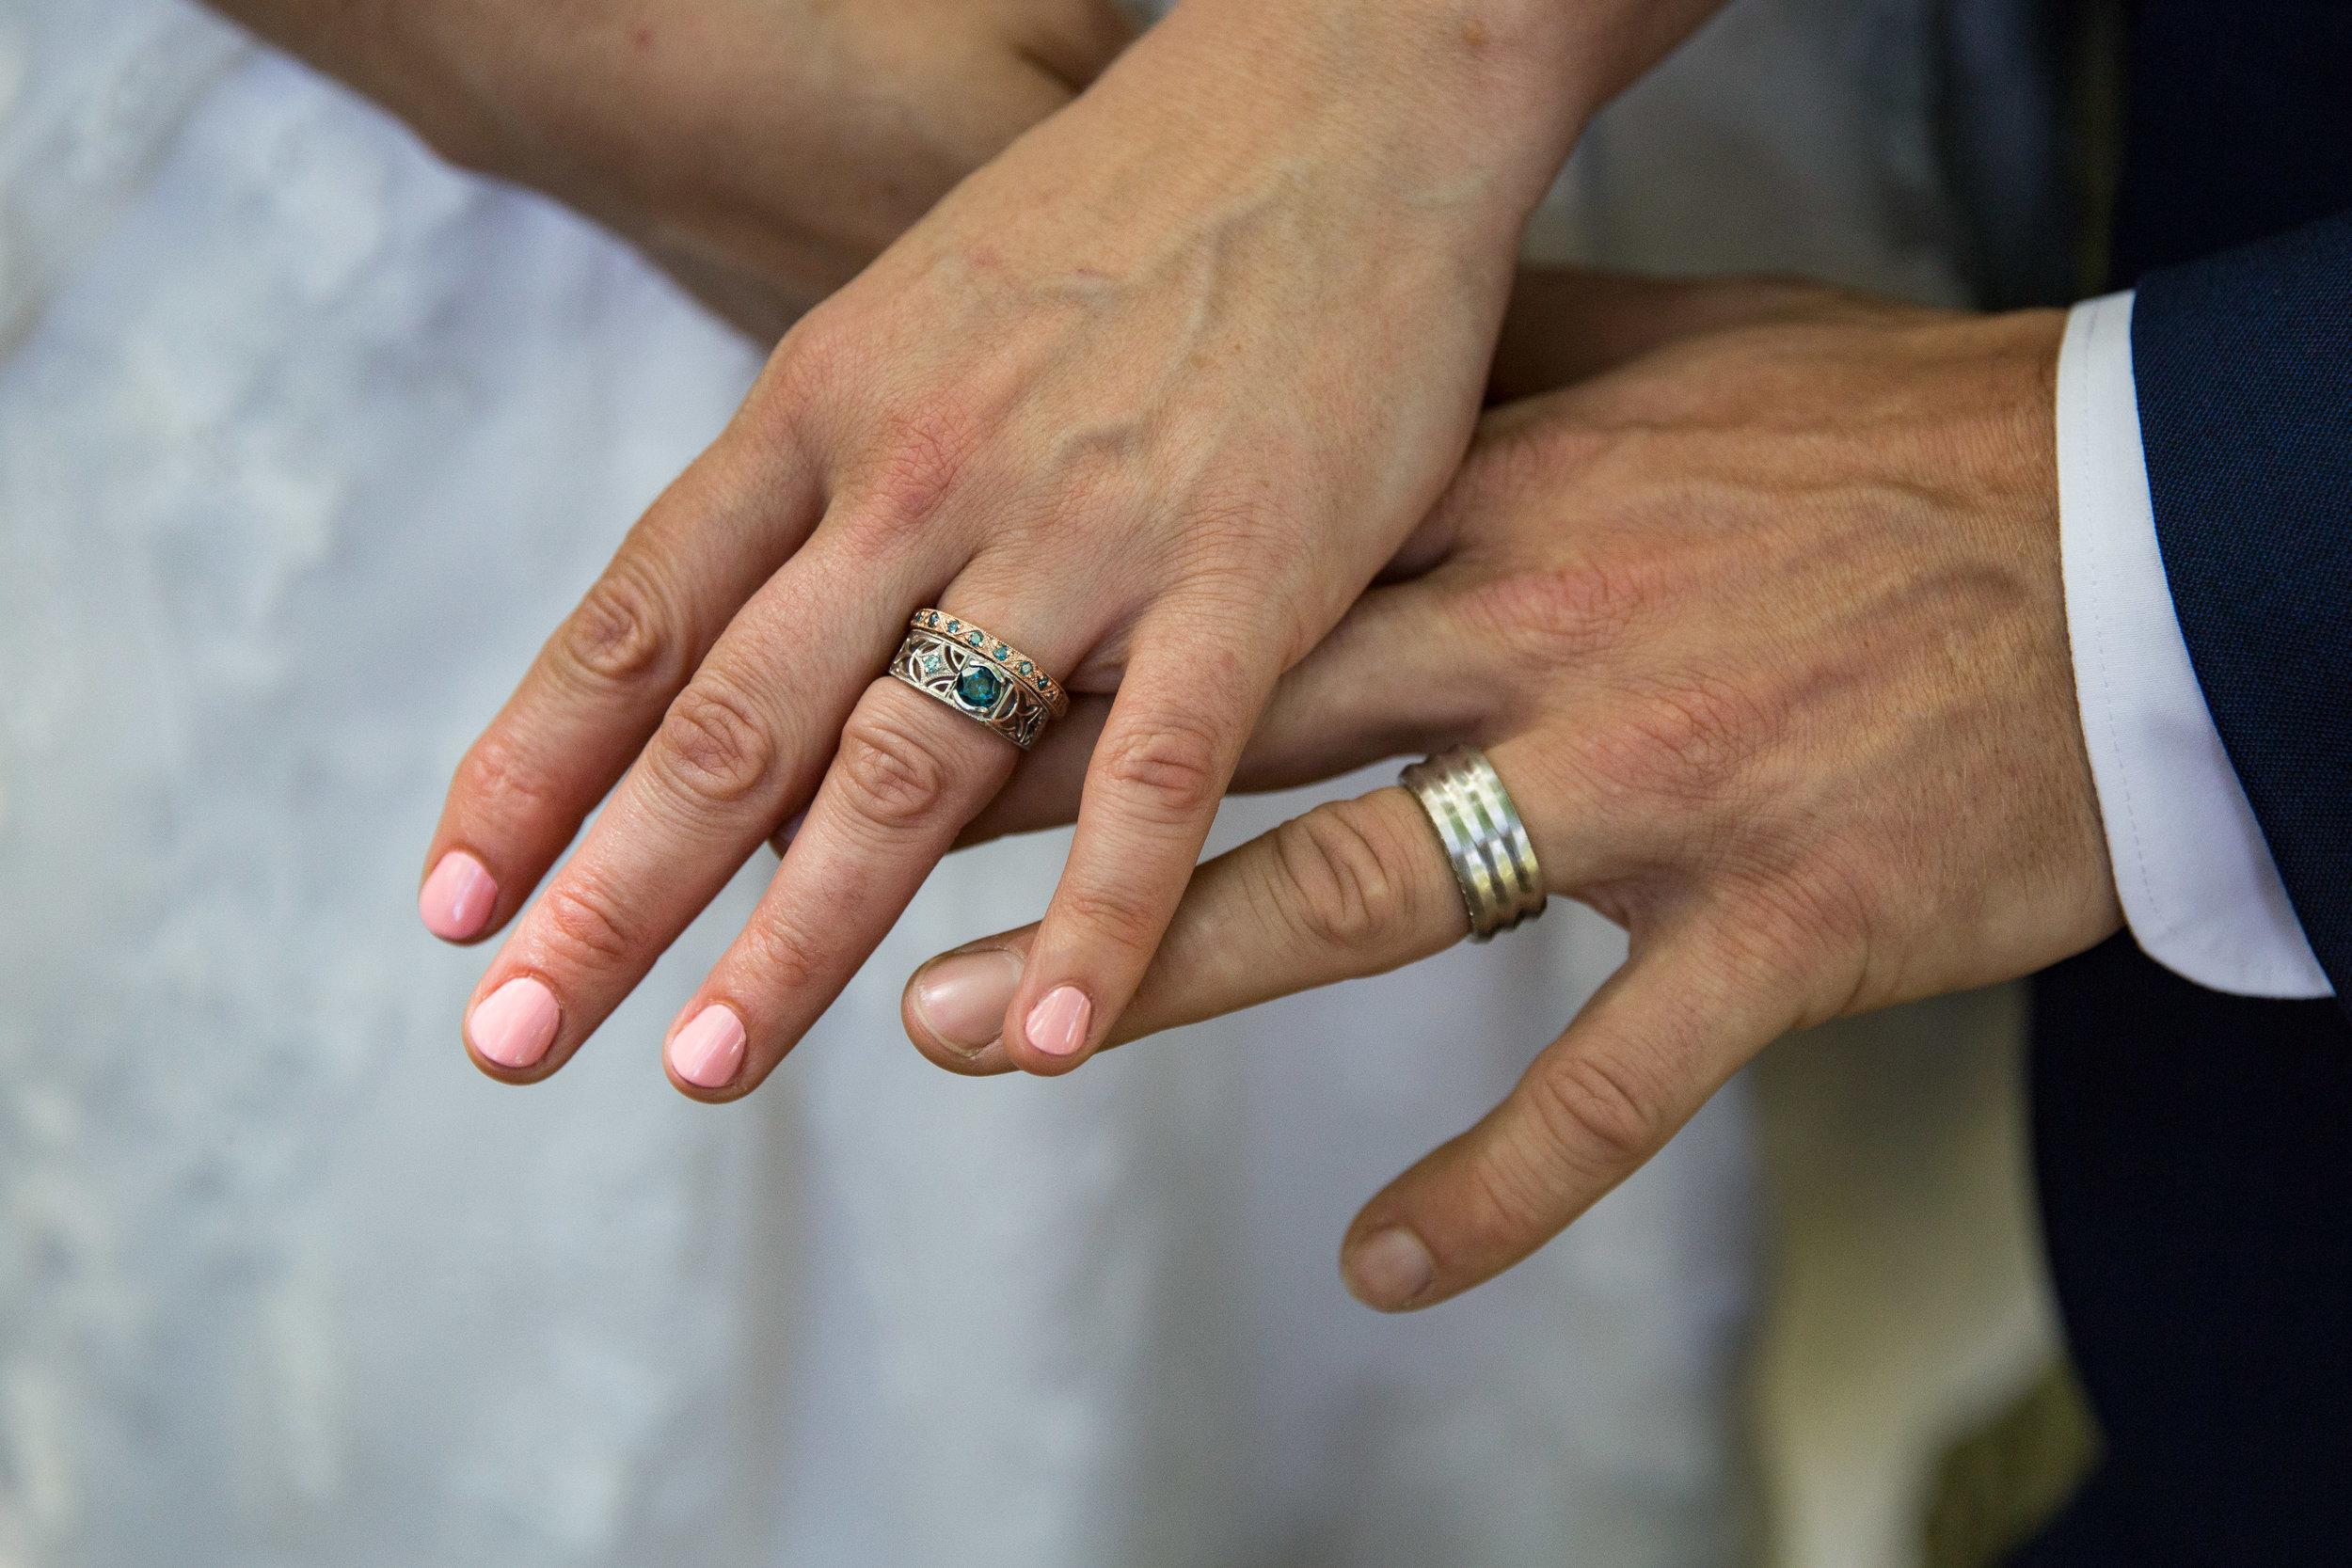 Natalie and Dallas Mooney Wedding 6-8-19_Tania Watt Photography-383.jpg